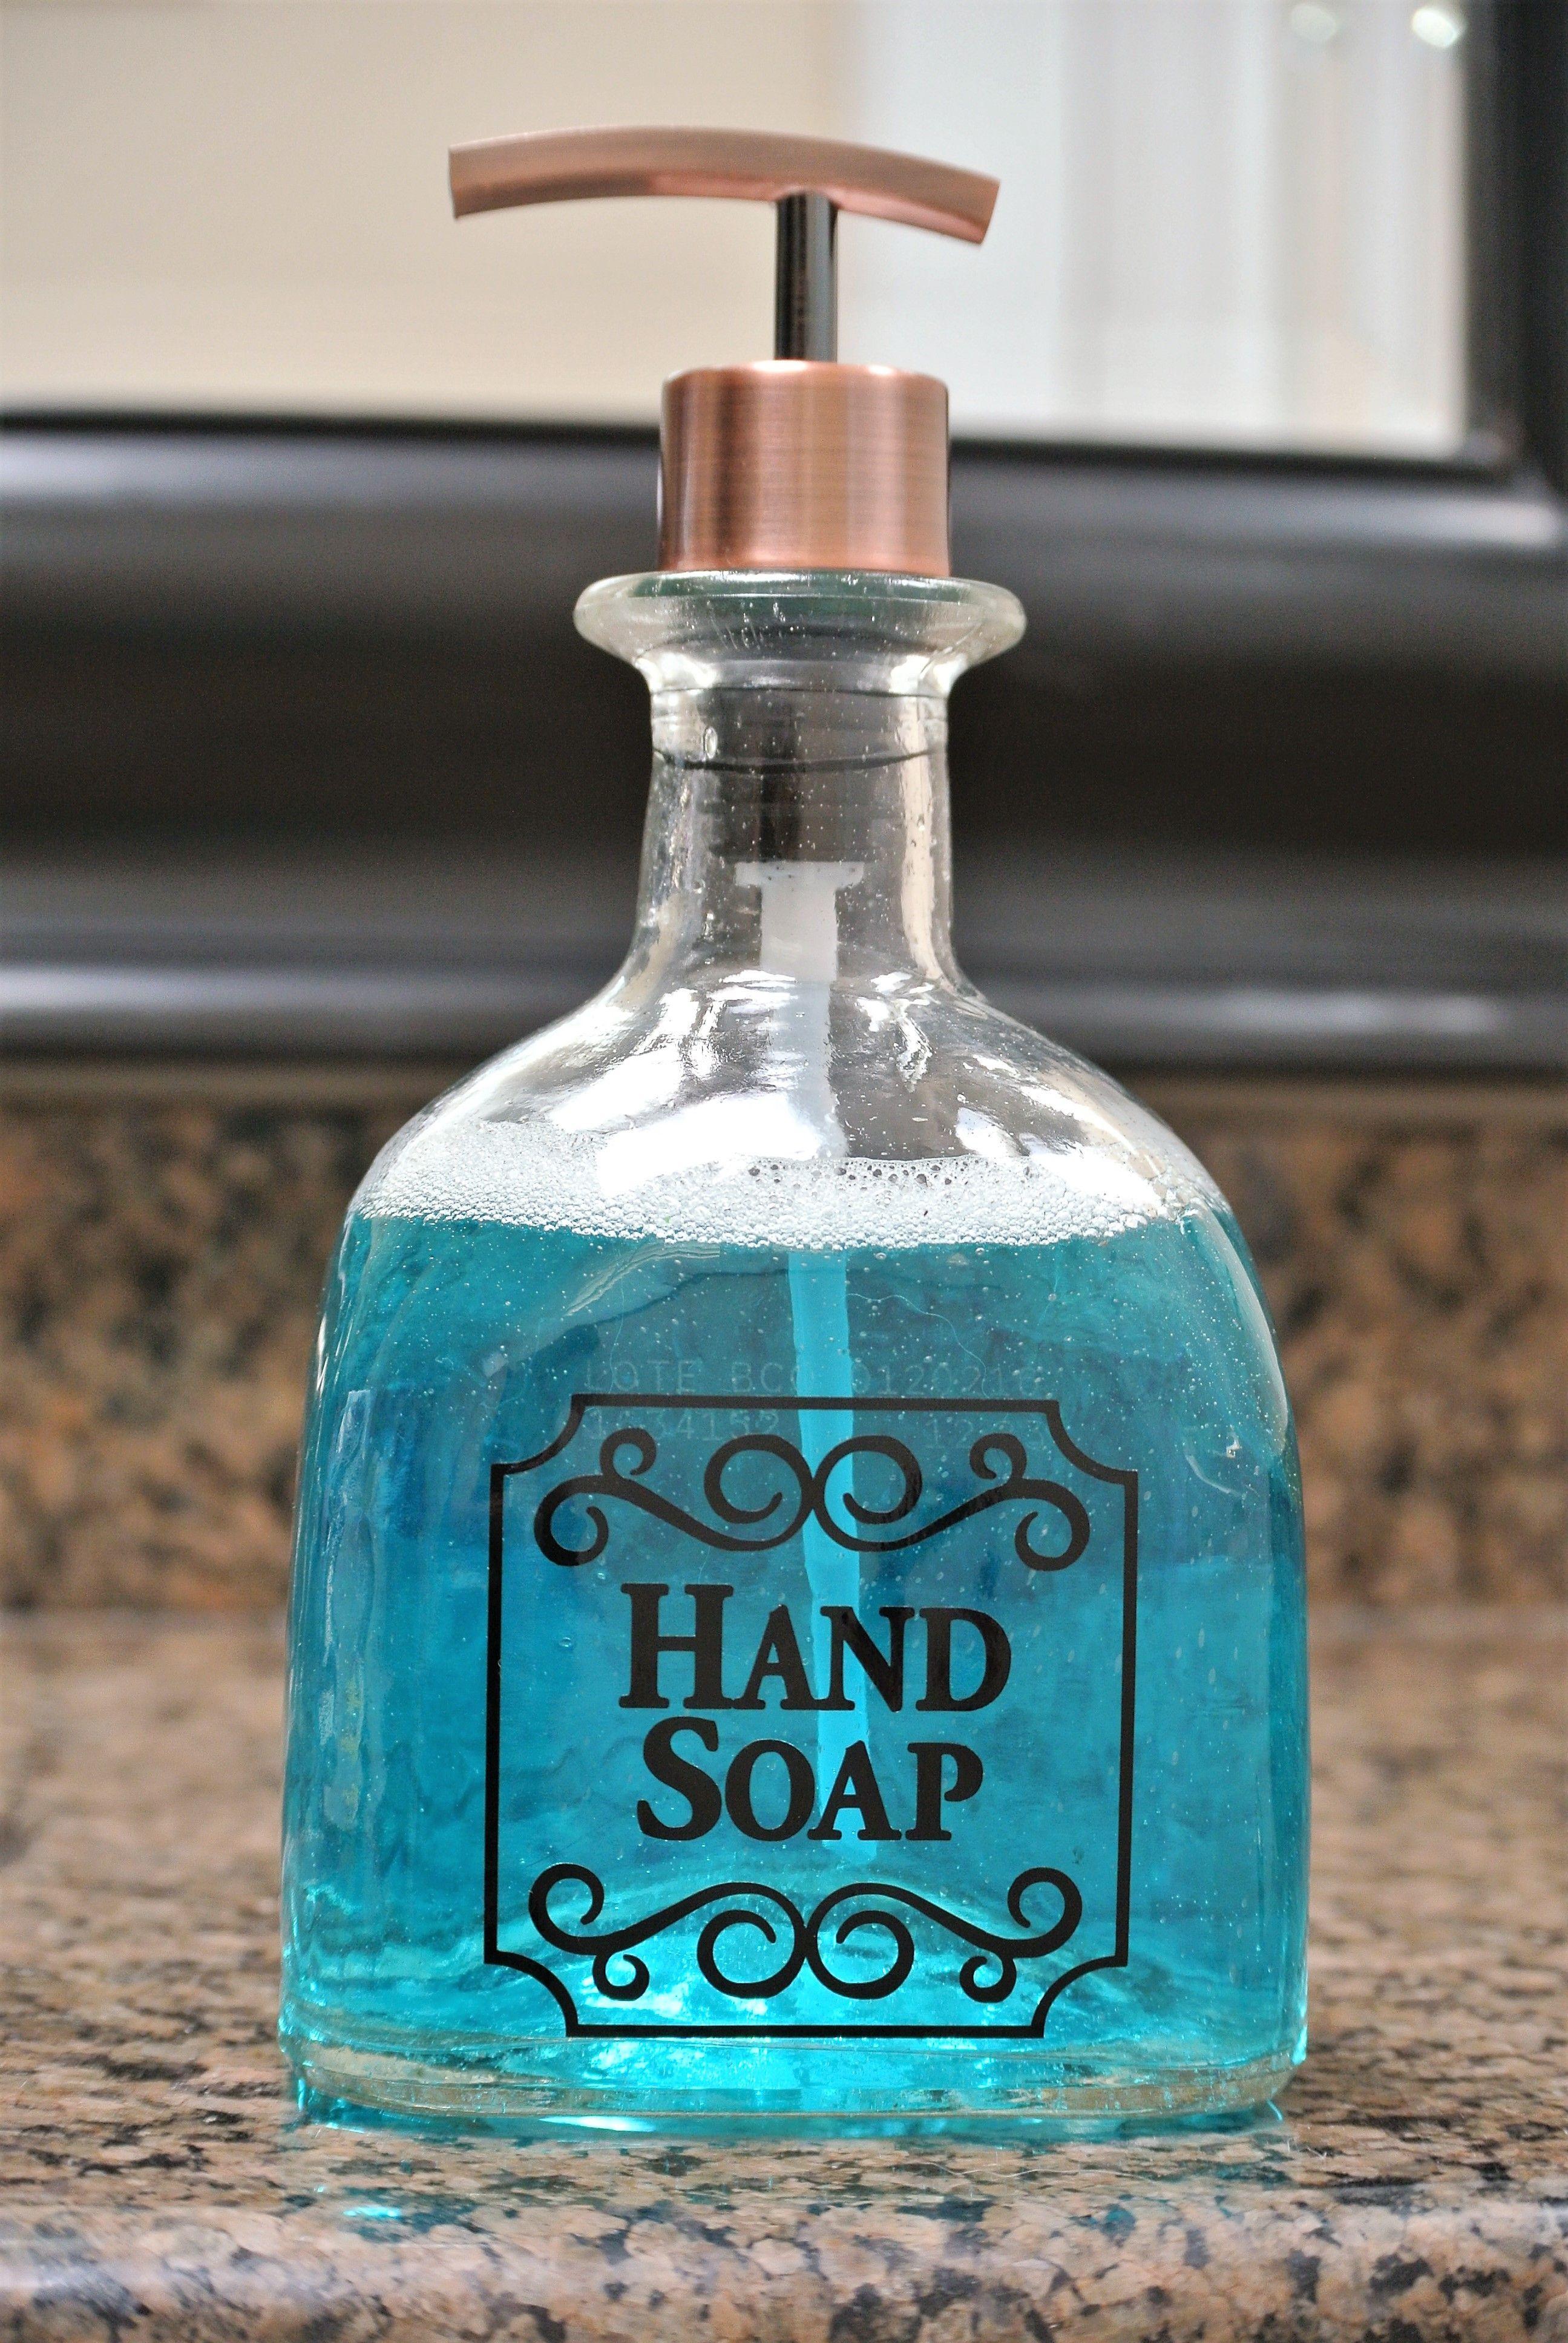 Patron Silver tequila glass bathroom soap or kitchen soap dispenser ...